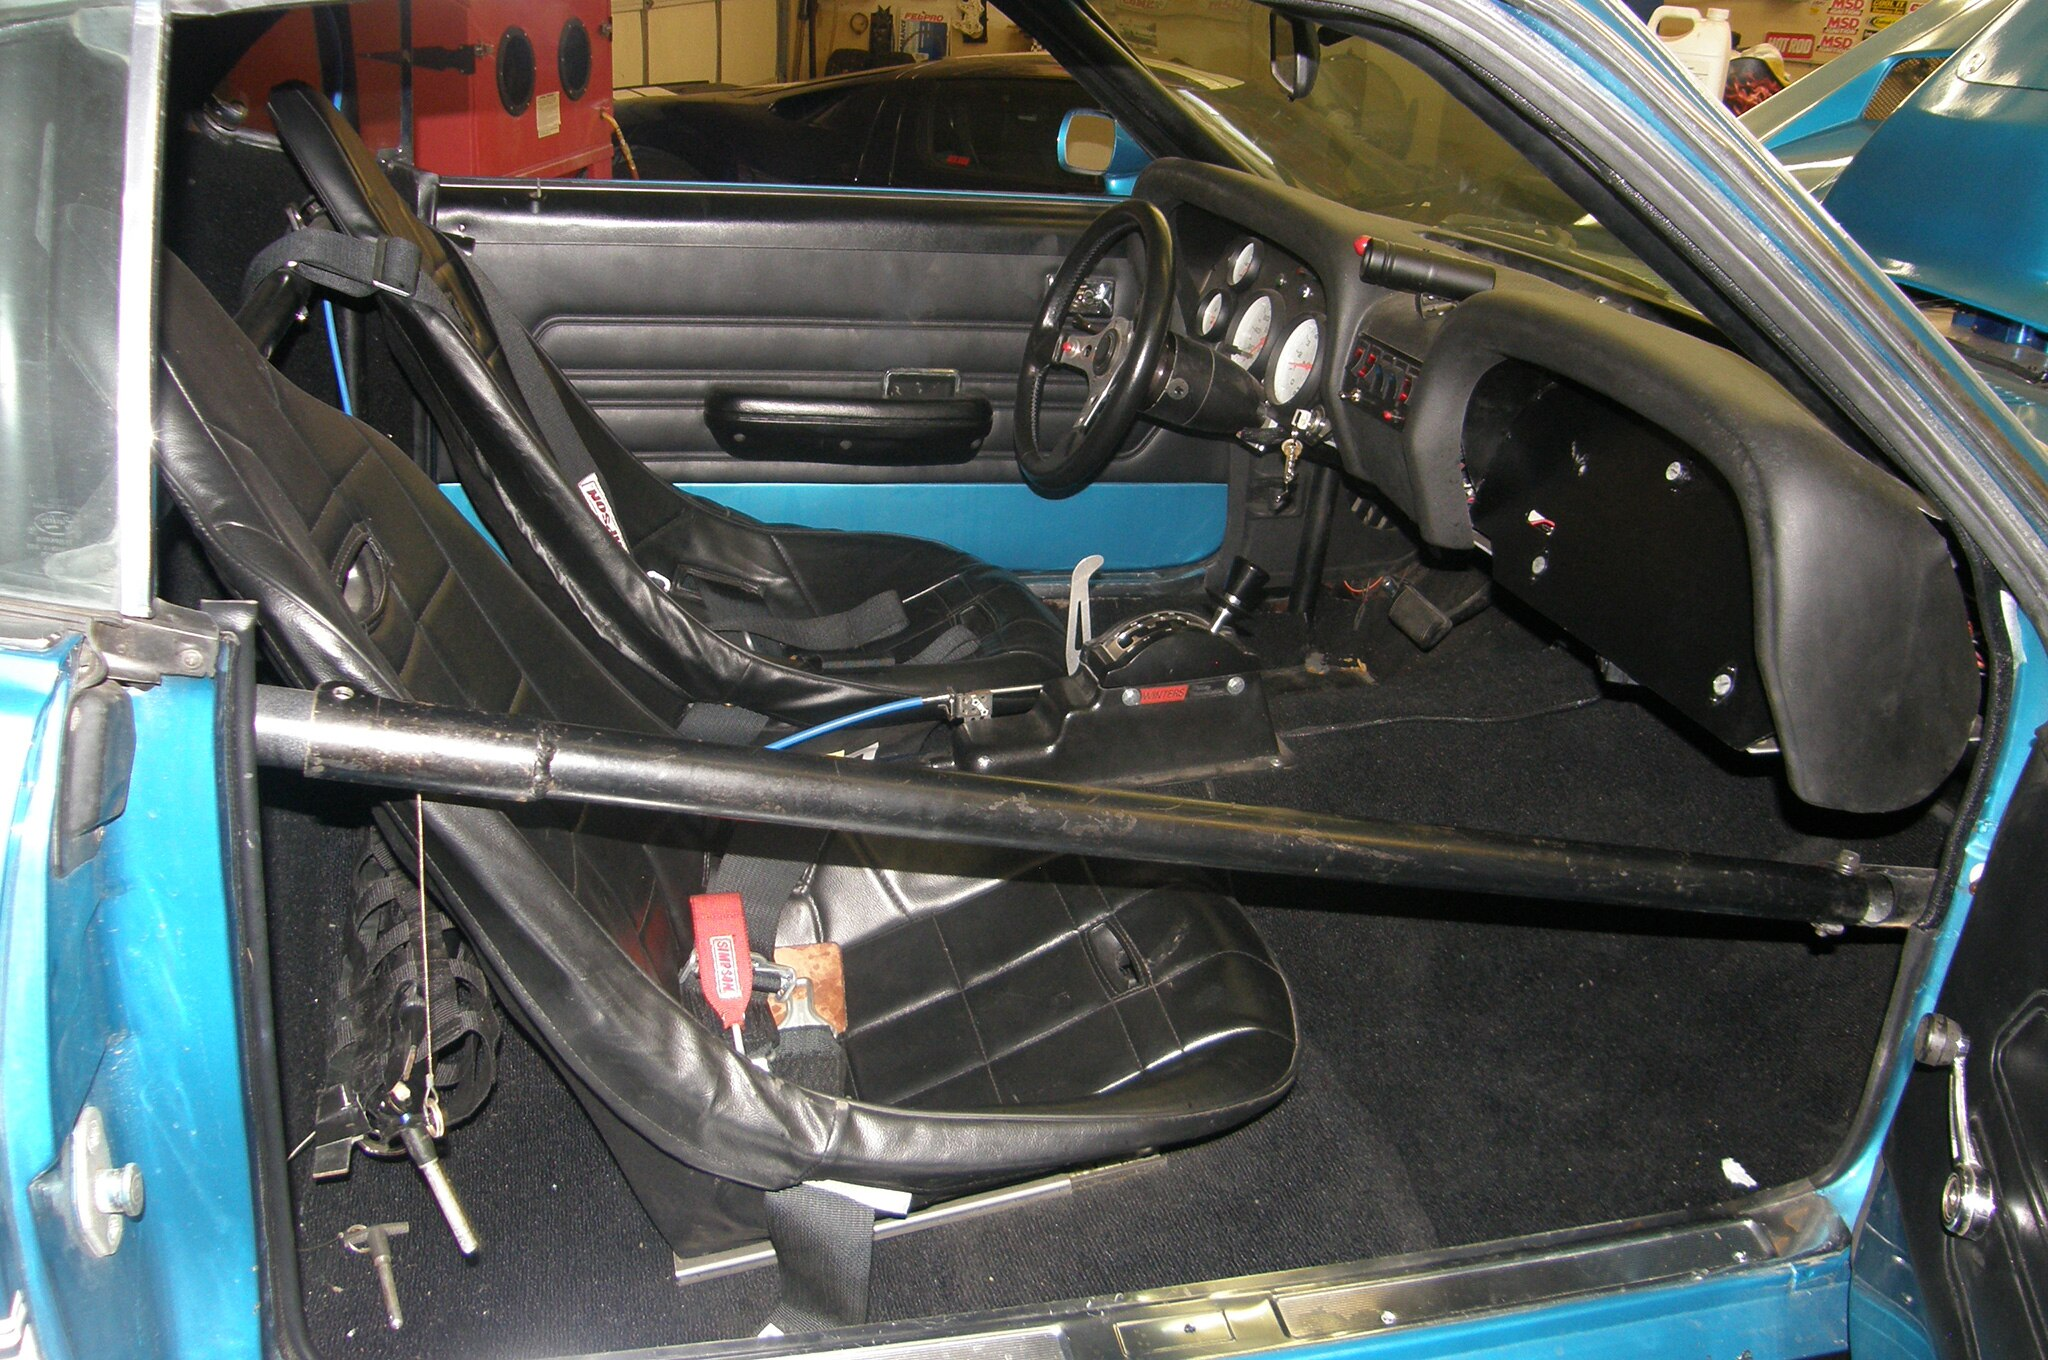 20 1969 Ford Mustang Interior Rollcage